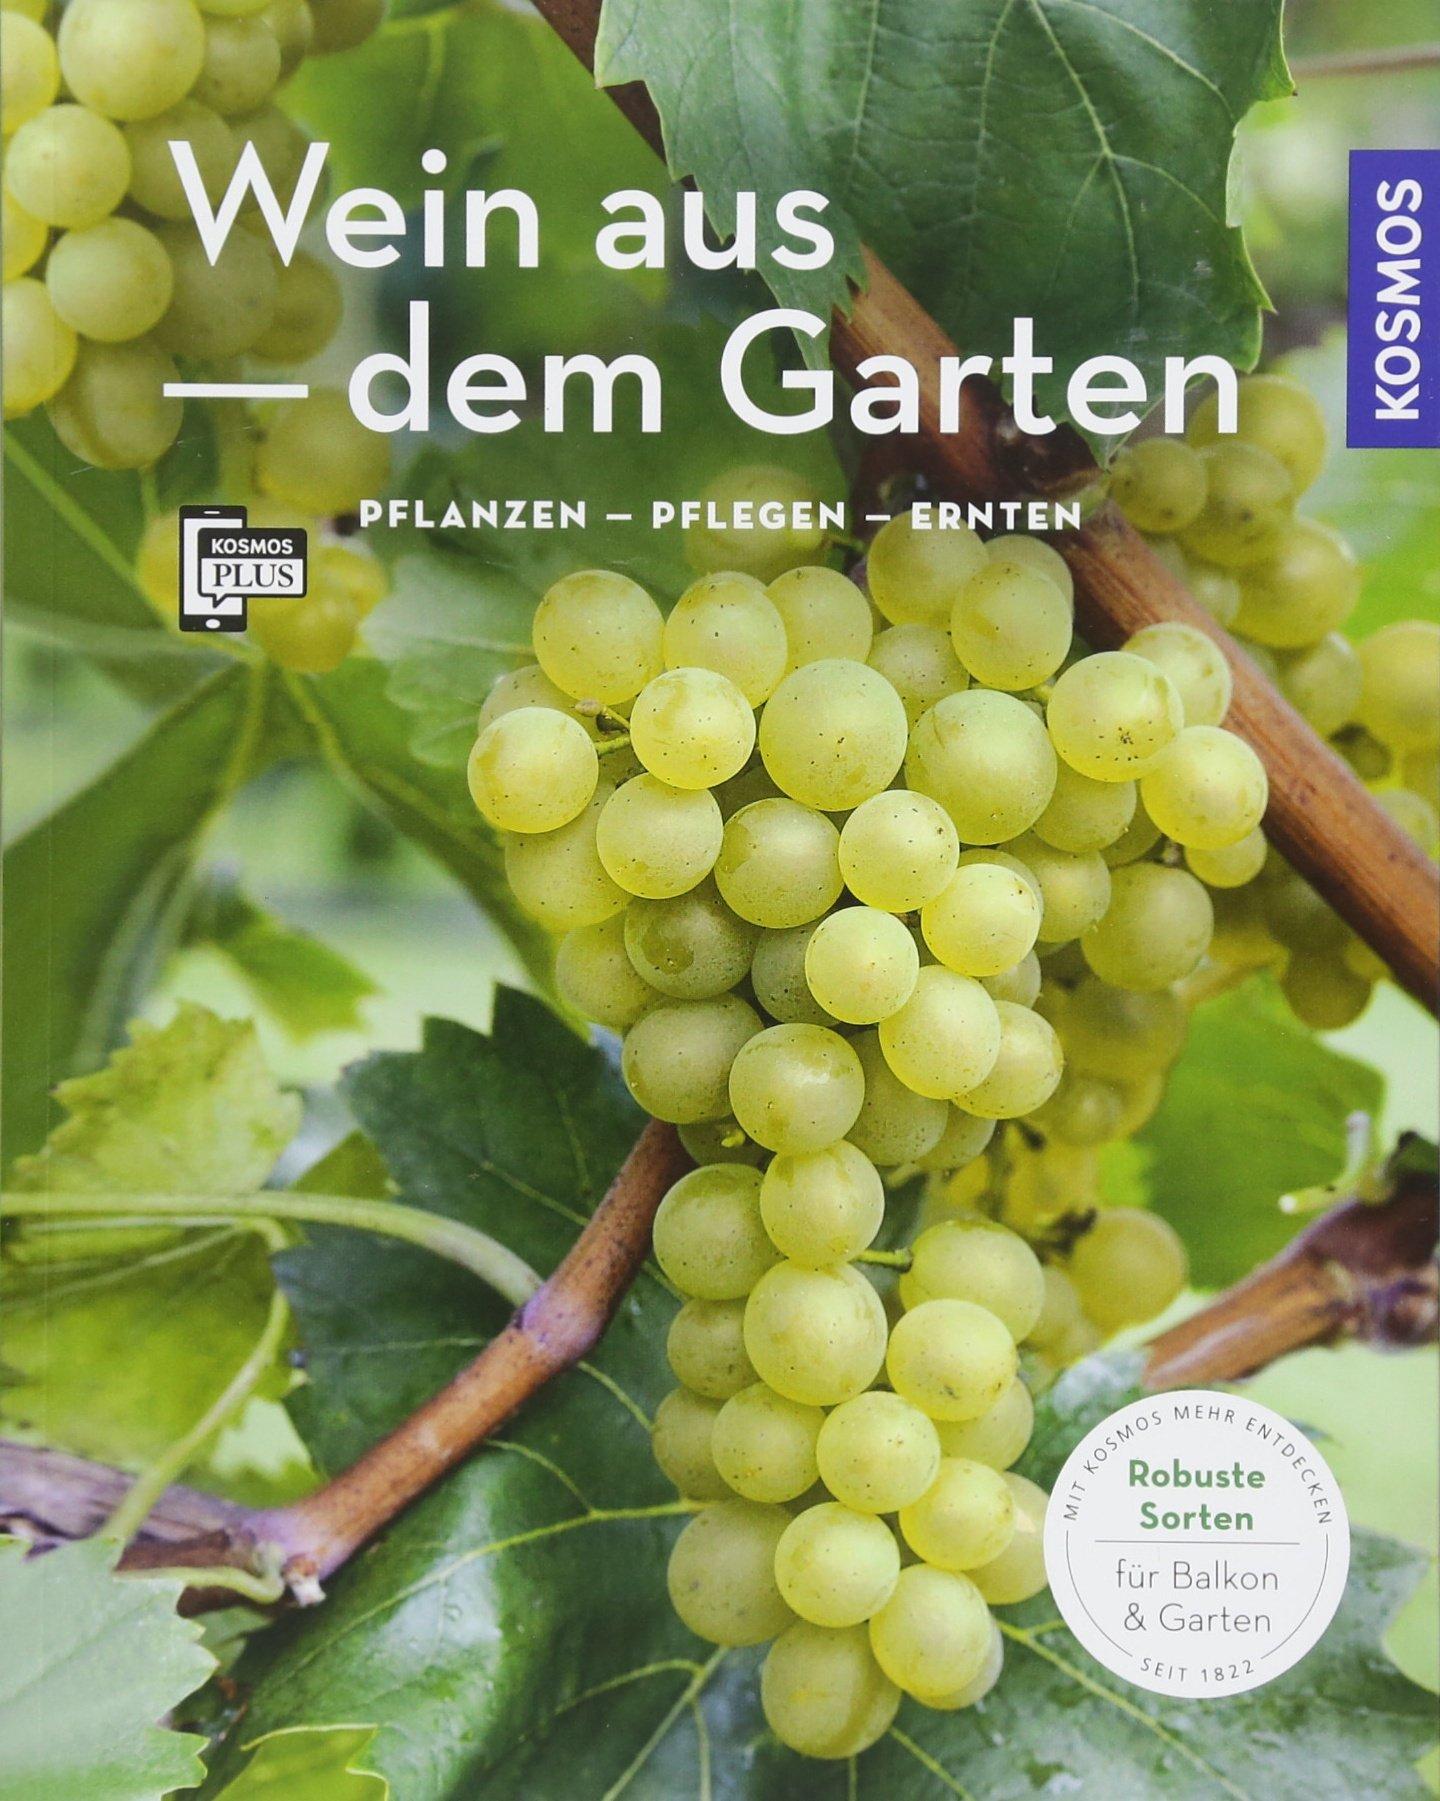 Fabelhaft Wein aus dem Garten Mein Garten : Pflanzen - Pflegen - Ernten @AZ_28